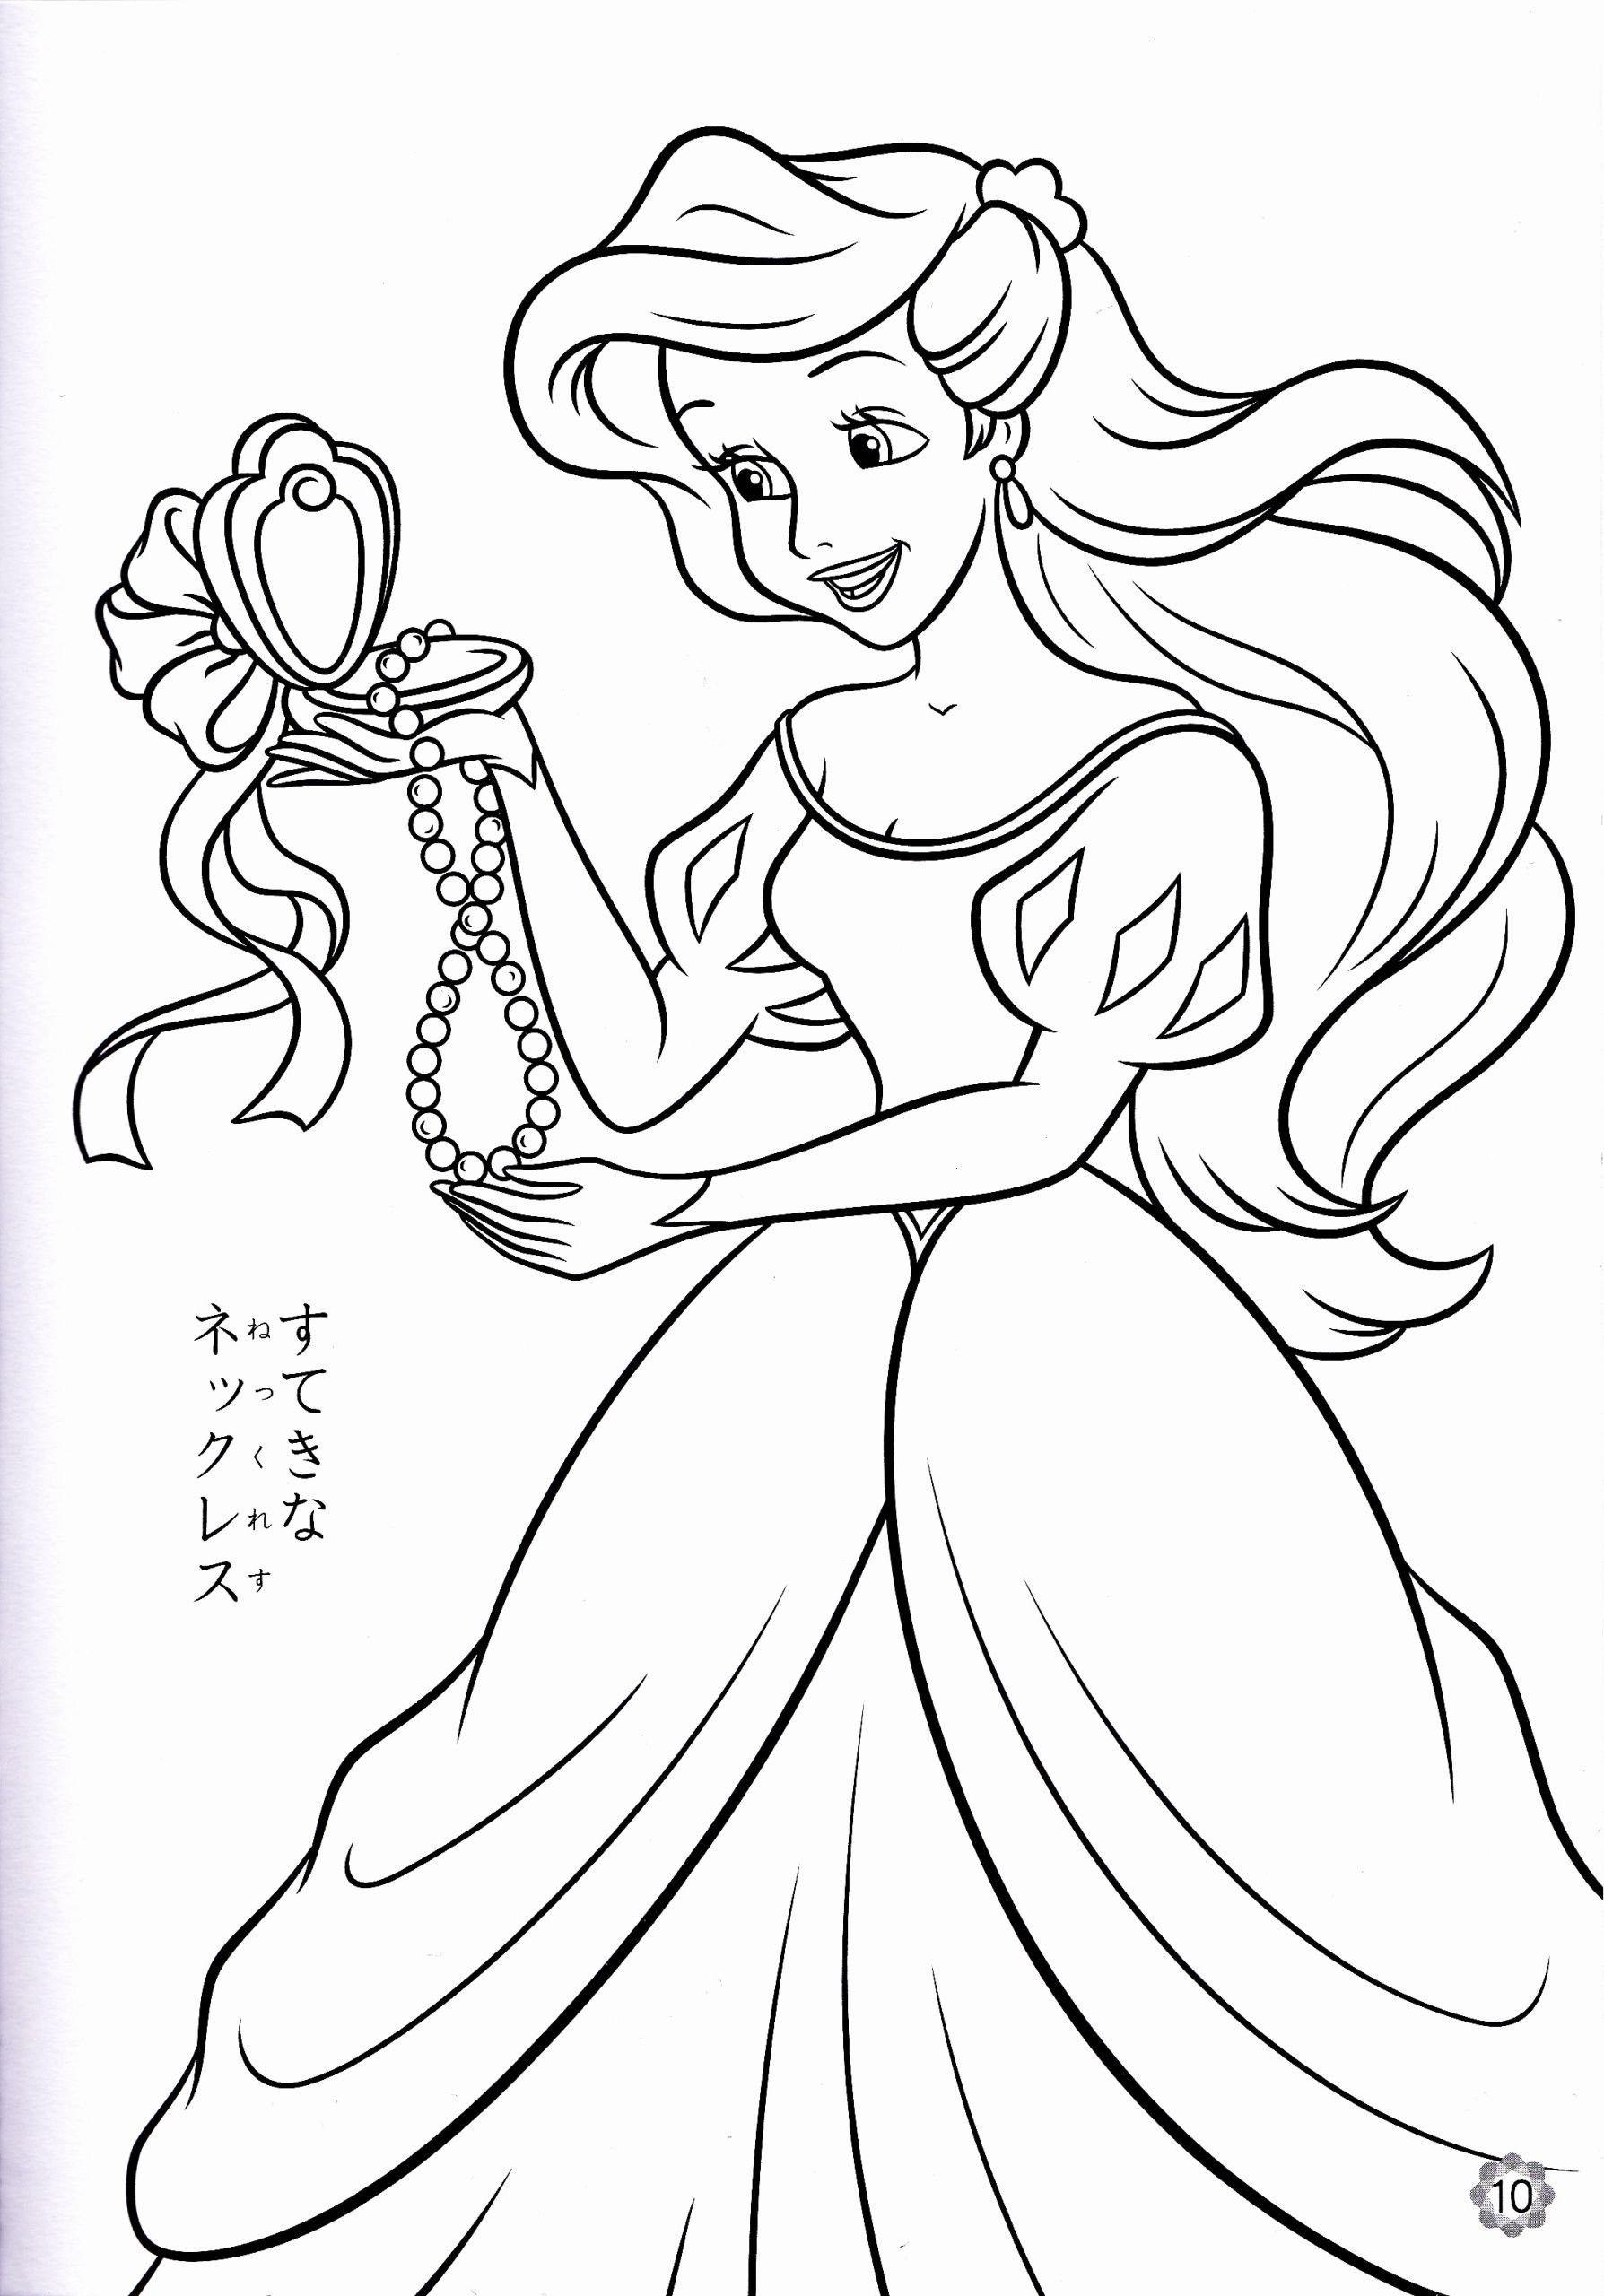 Coloring Page Disney Princess Youngandtae Com Ariel Coloring Pages Mermaid Coloring Pages Disney Coloring Sheets